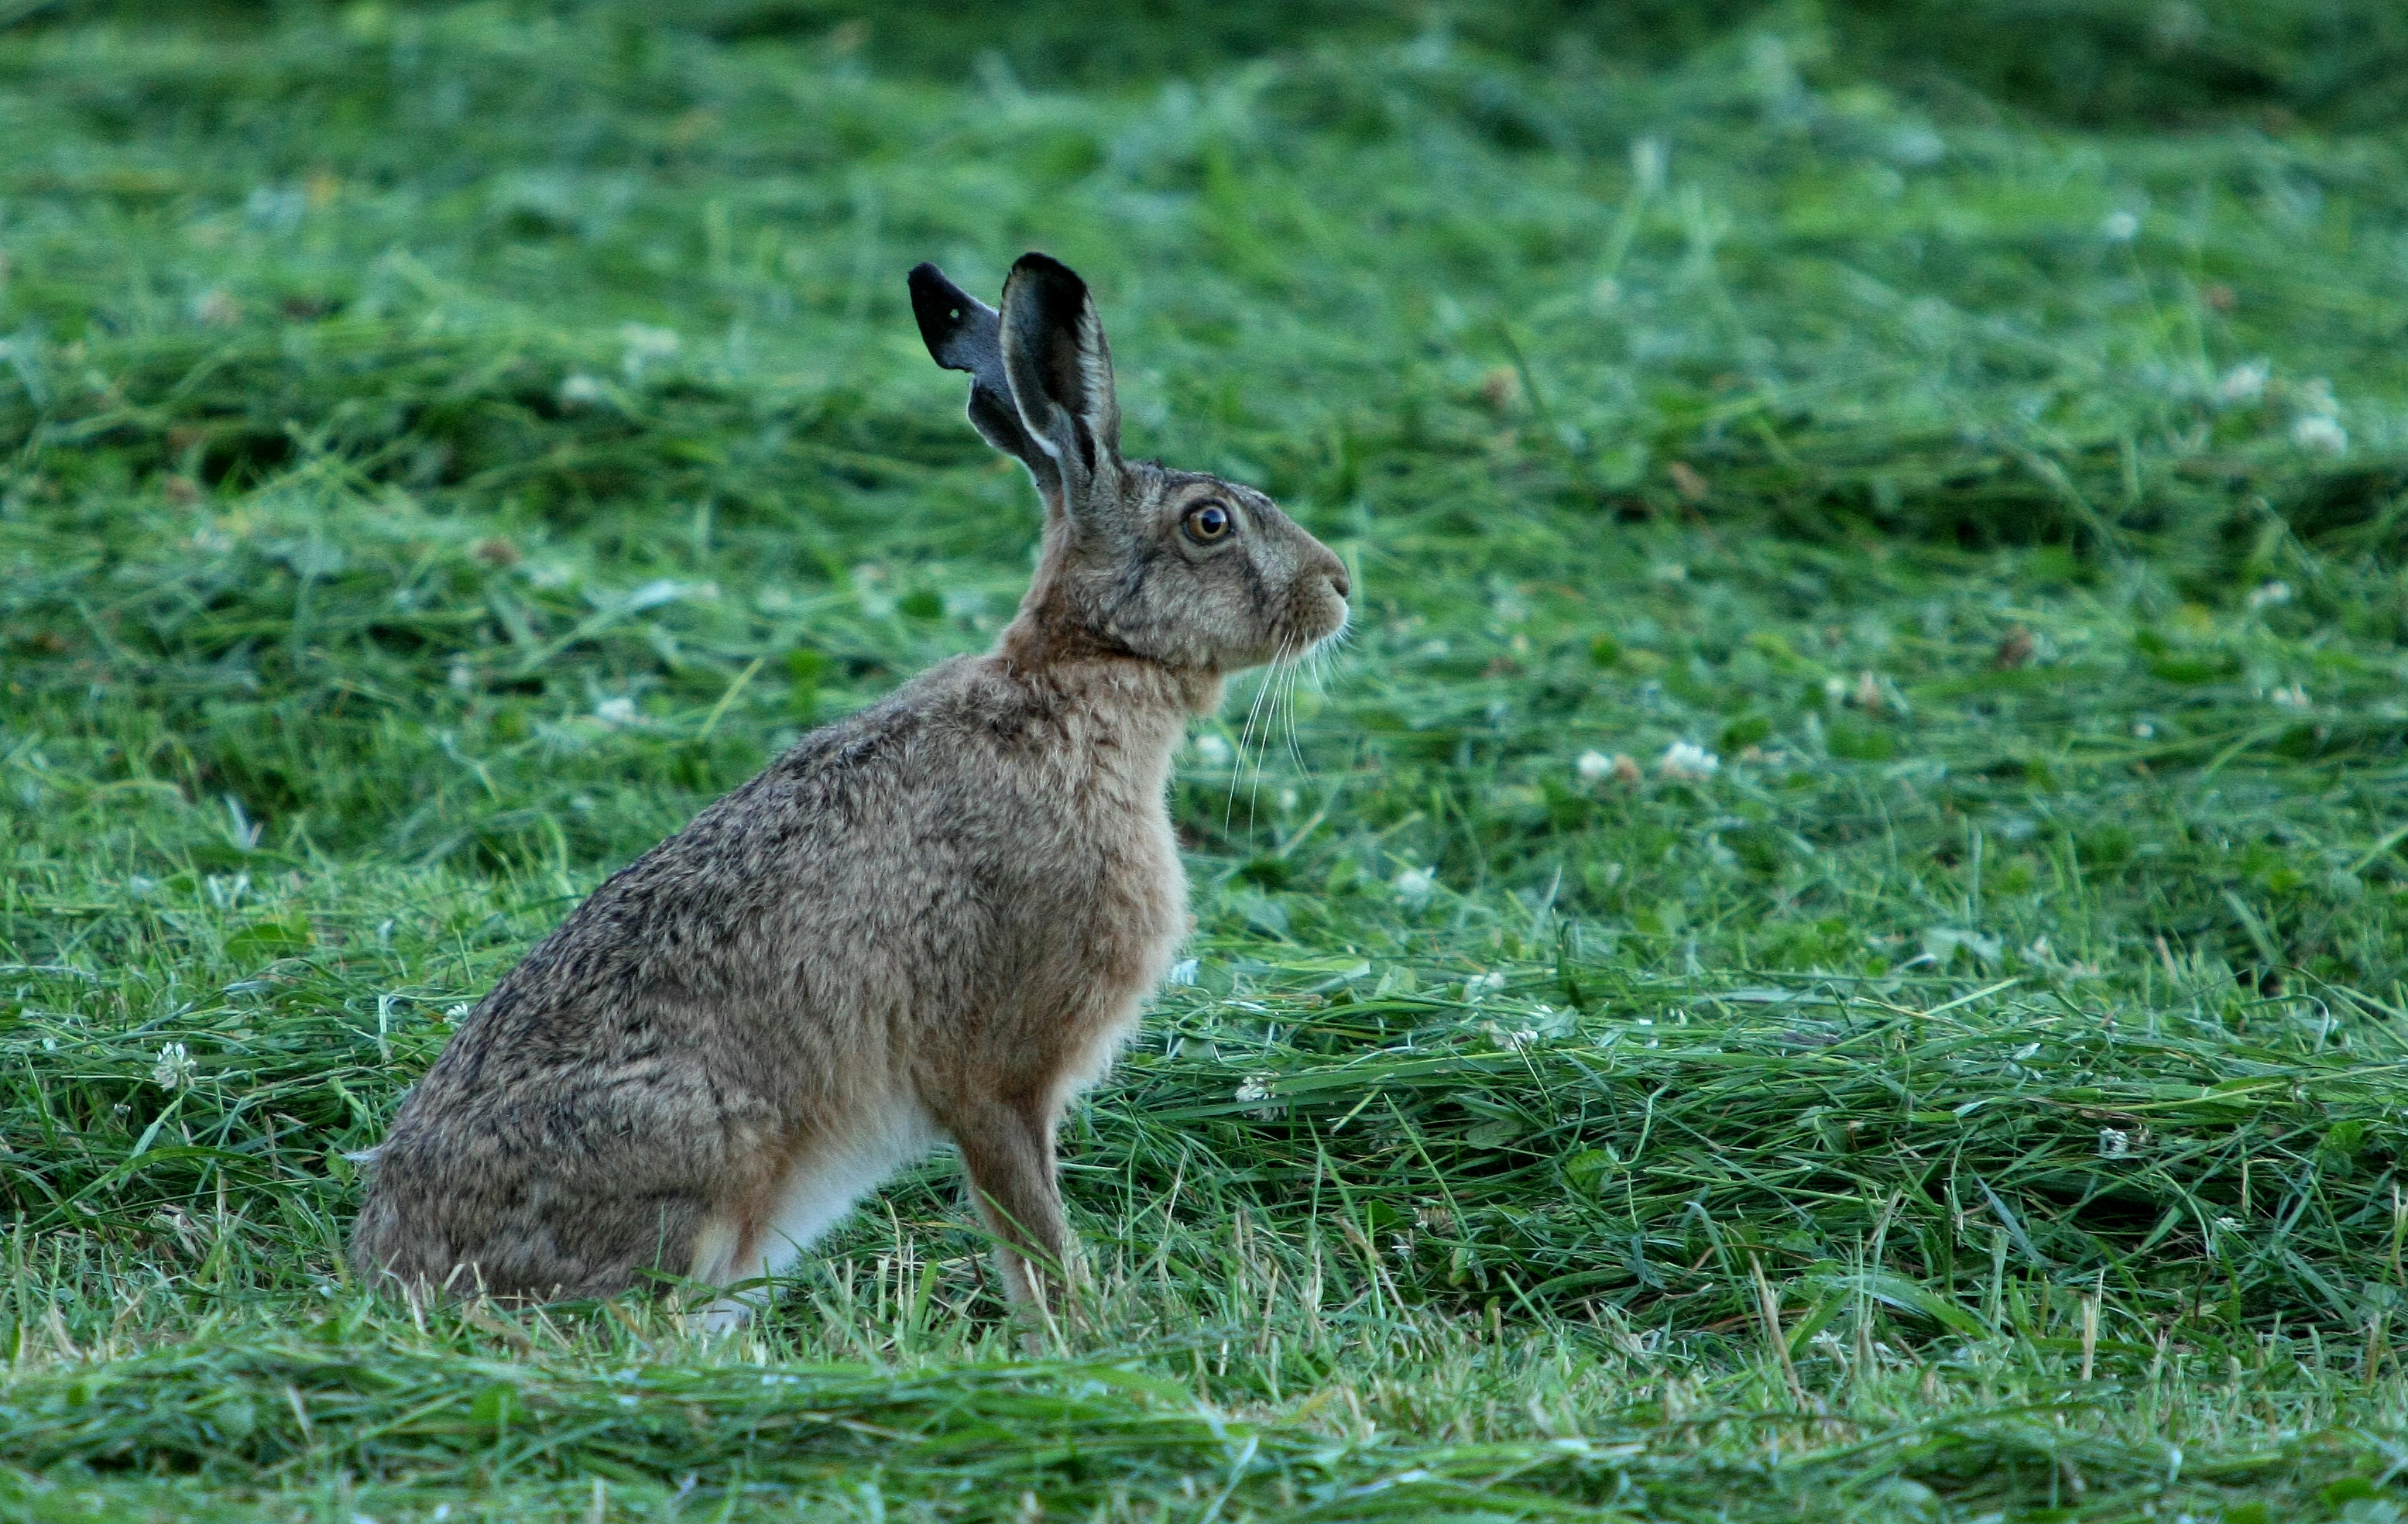 fakta om hare